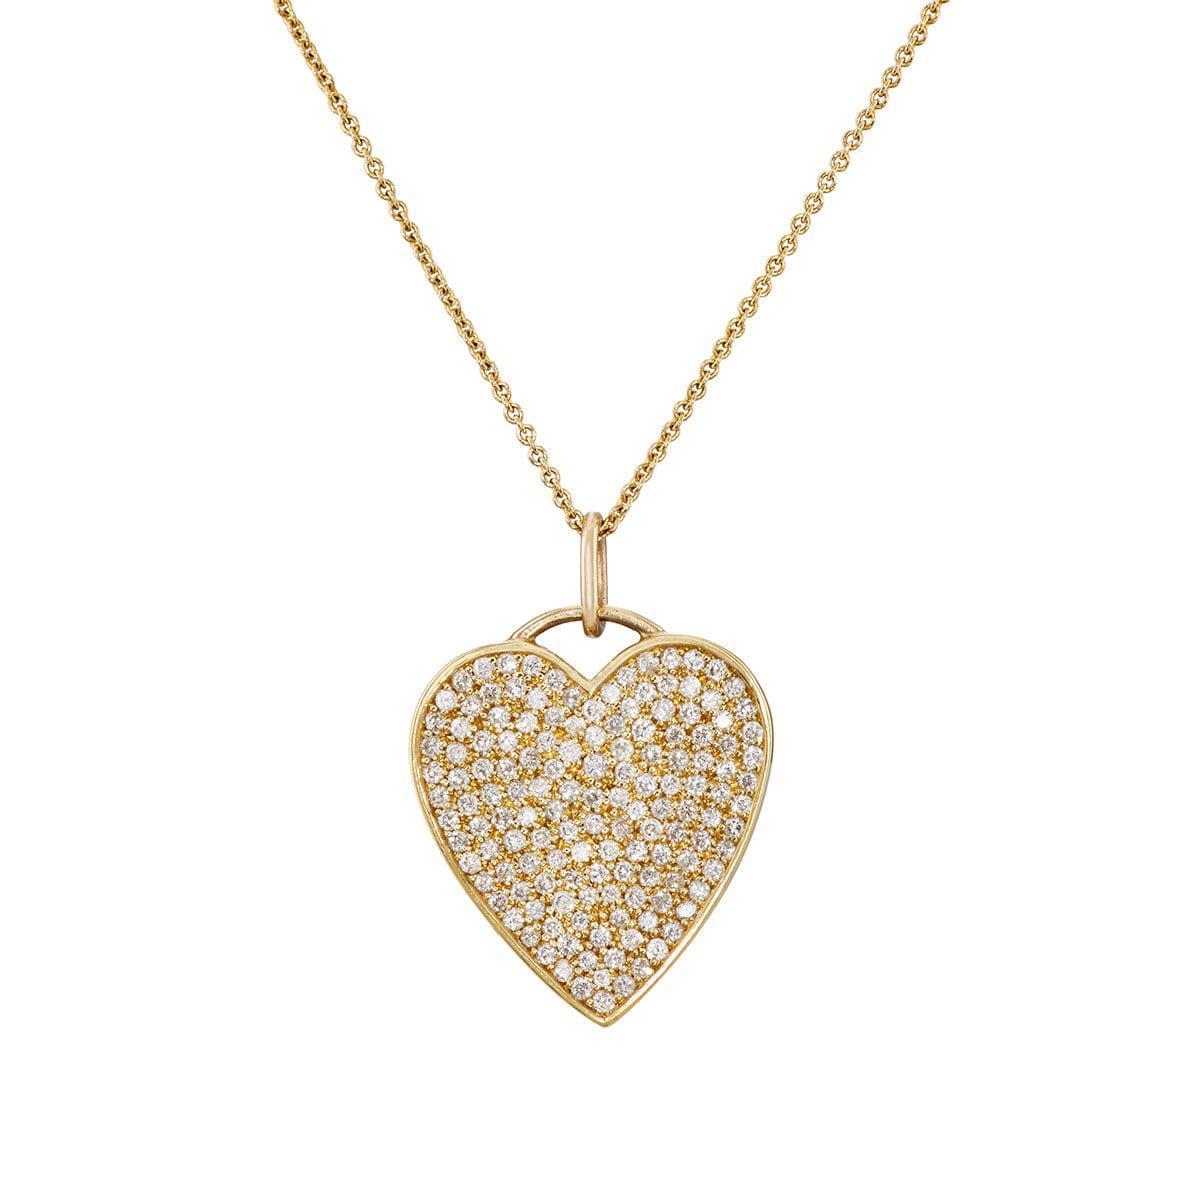 Jennifer Meyer Womens Onyx & Diamond Heart Pendant Necklace KqS1HDrv